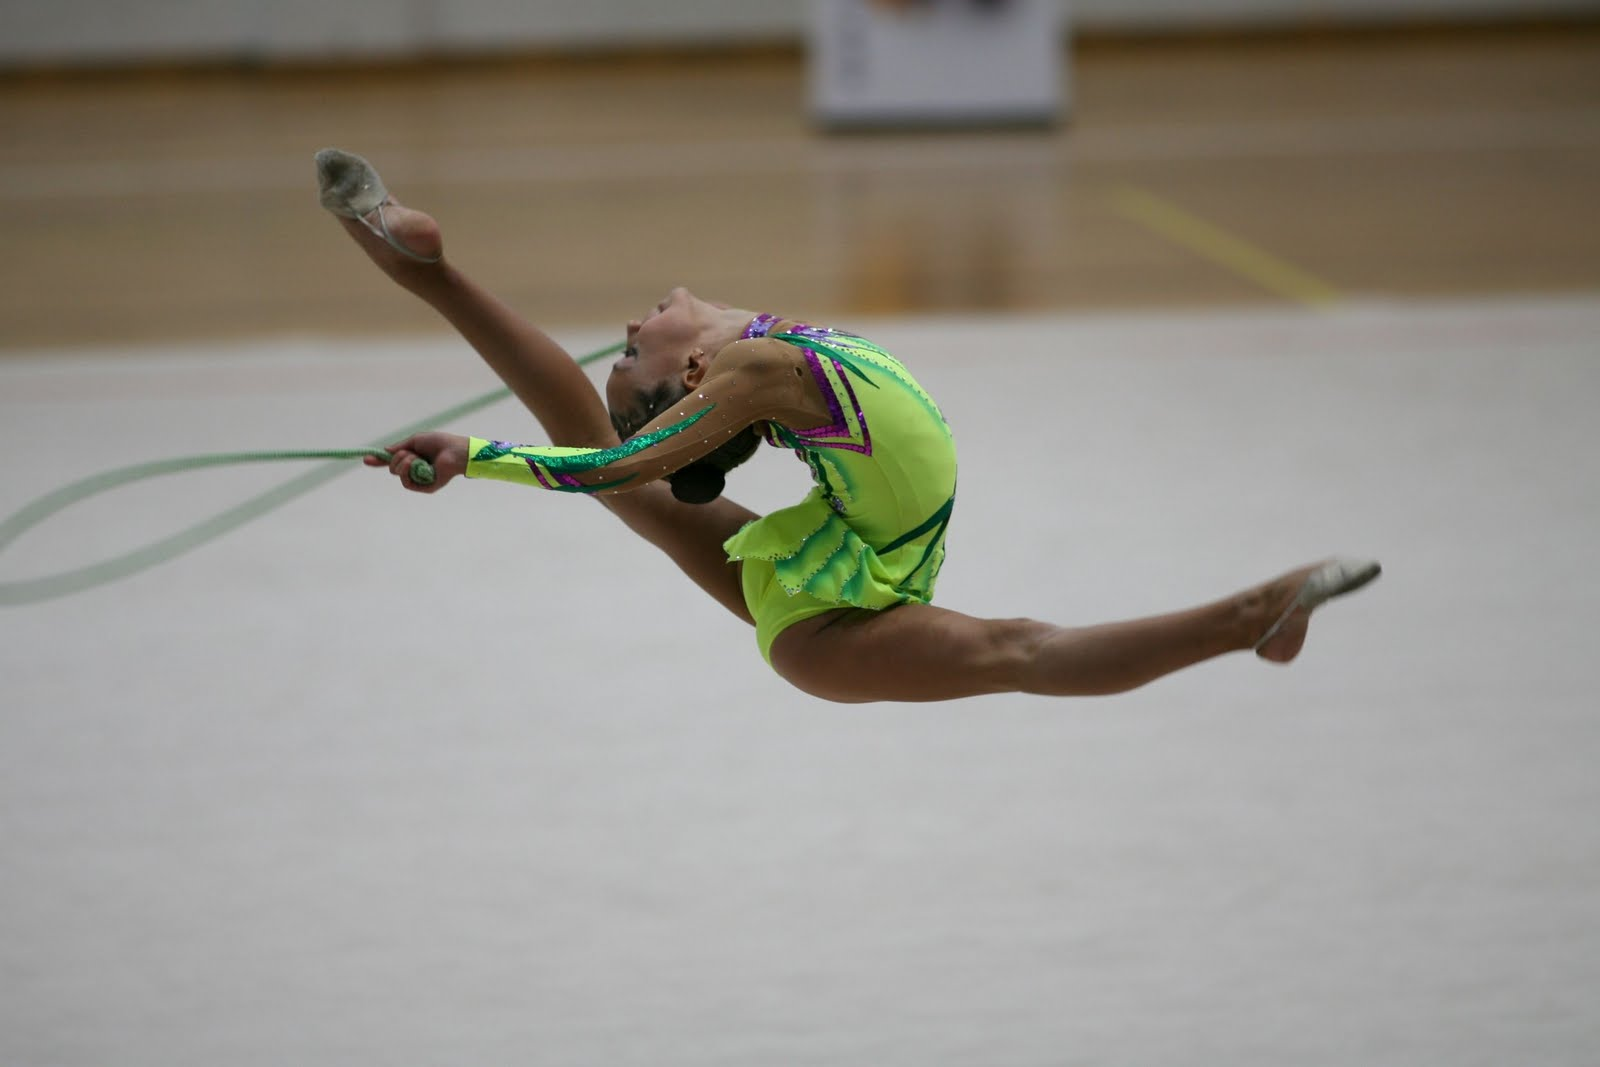 Ballet y gimnasia ritmica for Gimnasia gimnasia